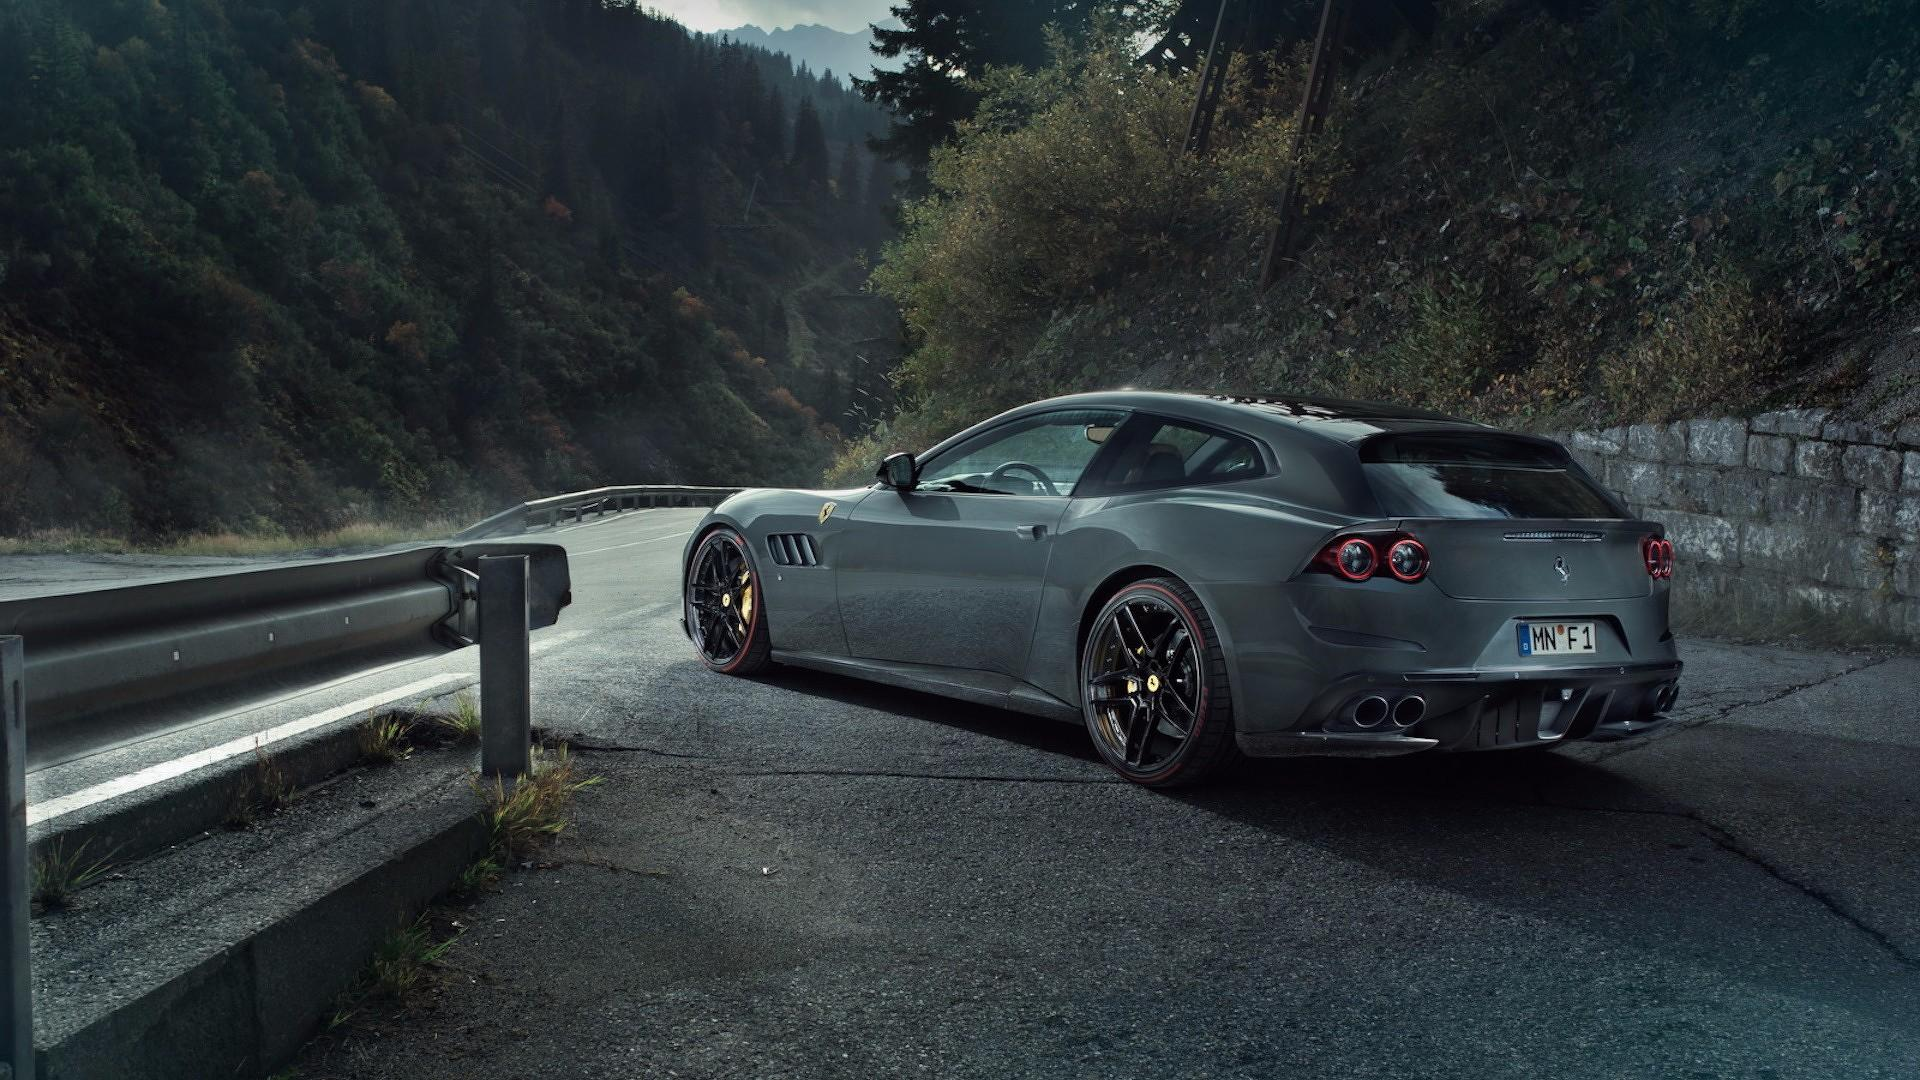 Elon Musk Car In Spac Wallpaper Ferrari F12 Goes Body Building Liberty Walk Kit Rendered